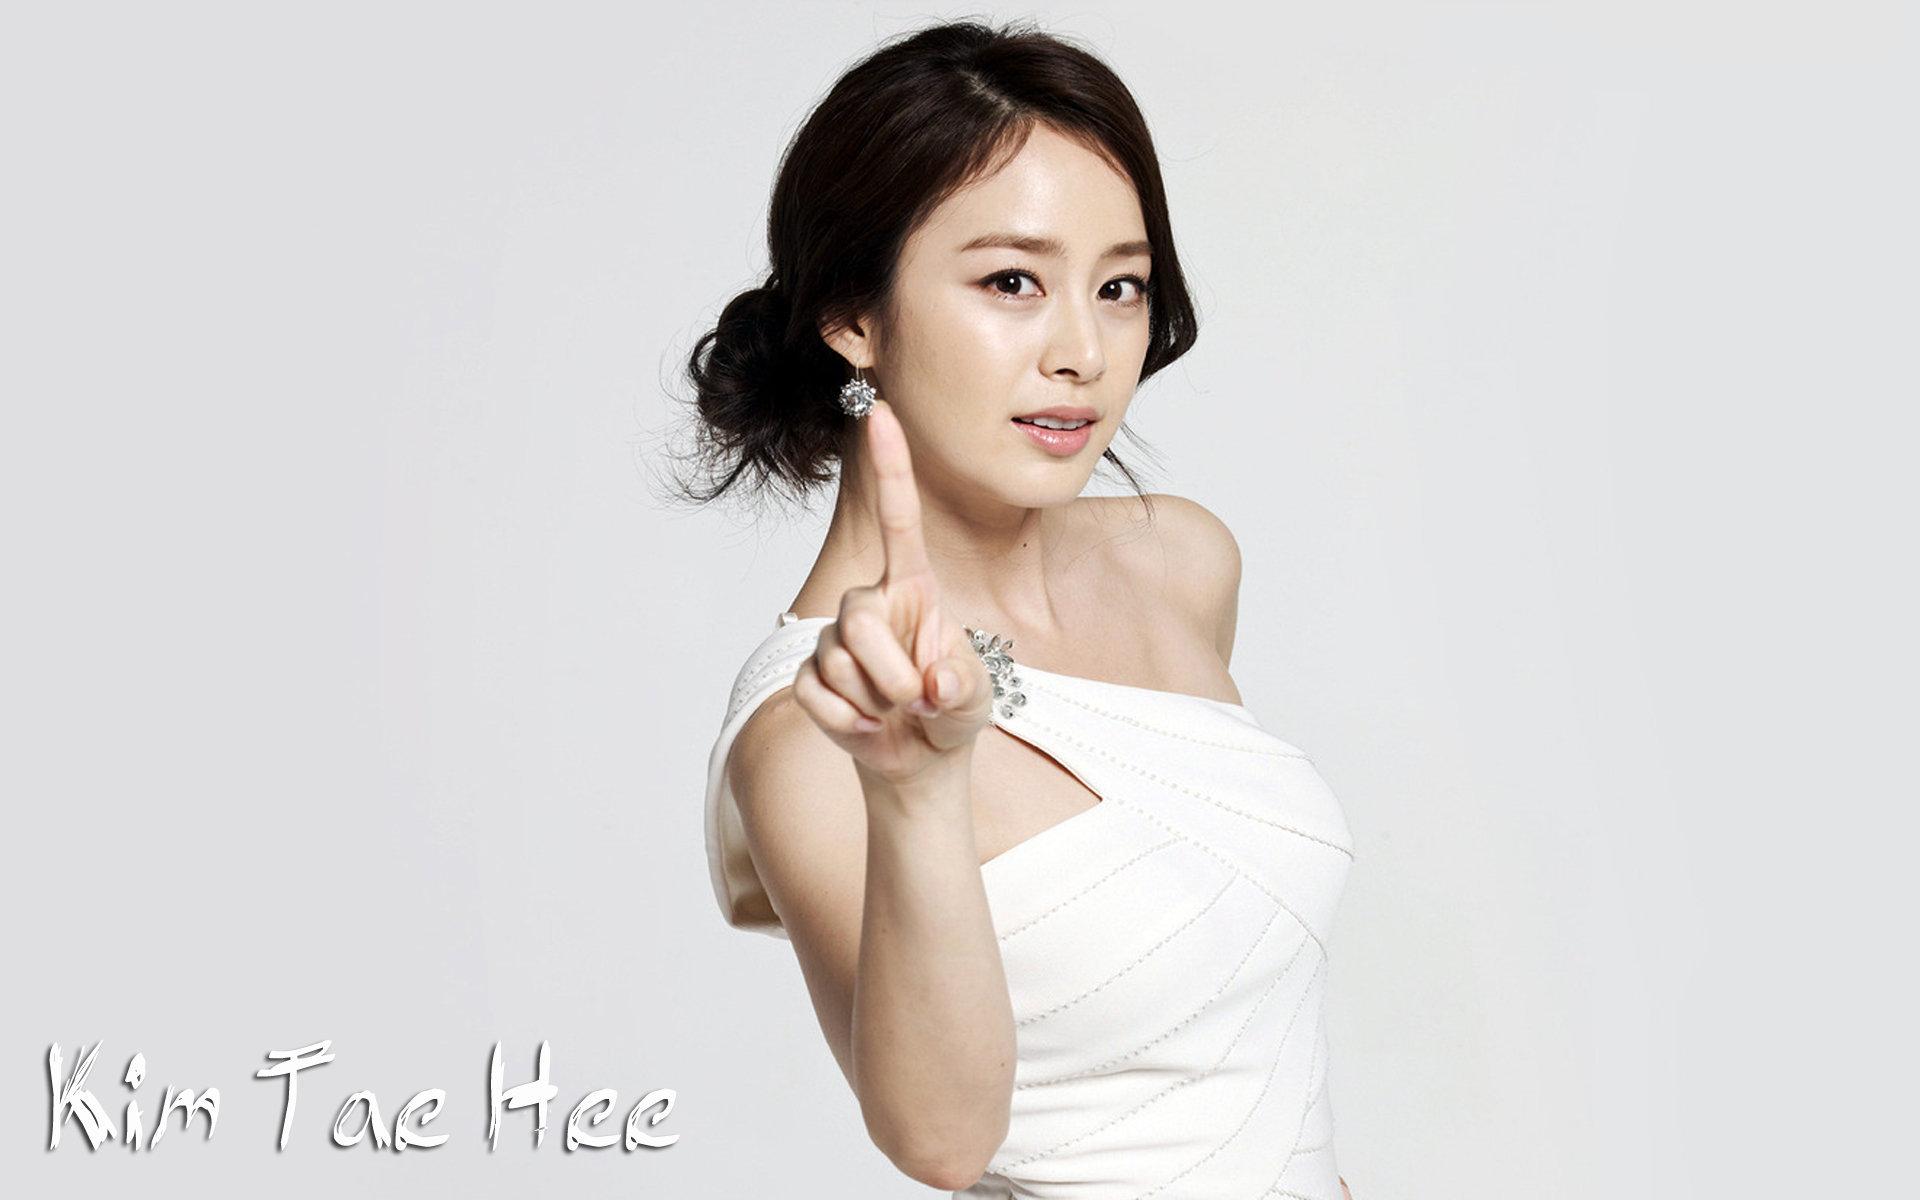 Foto Park Ju Young Suami Dari Kim Hee Sun Oxca Klb 108 17 Inch Lcd Console With 8 Port Kvm Switch